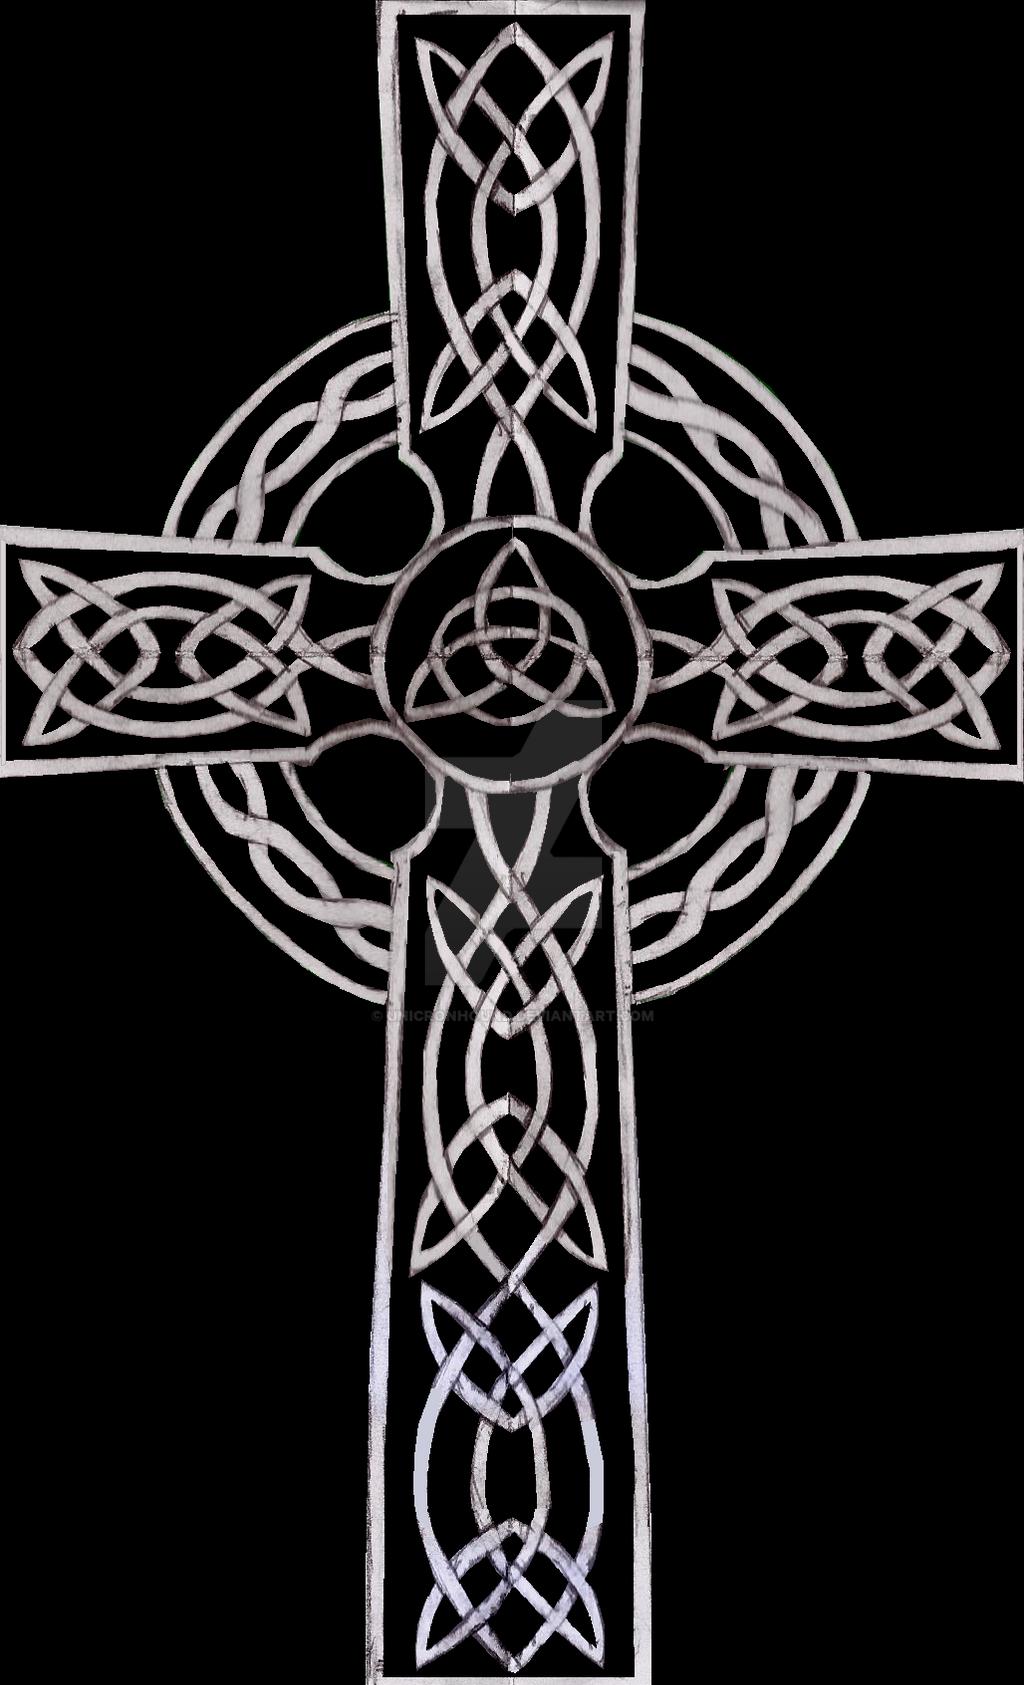 Celtic Cross Black by UnicronHound